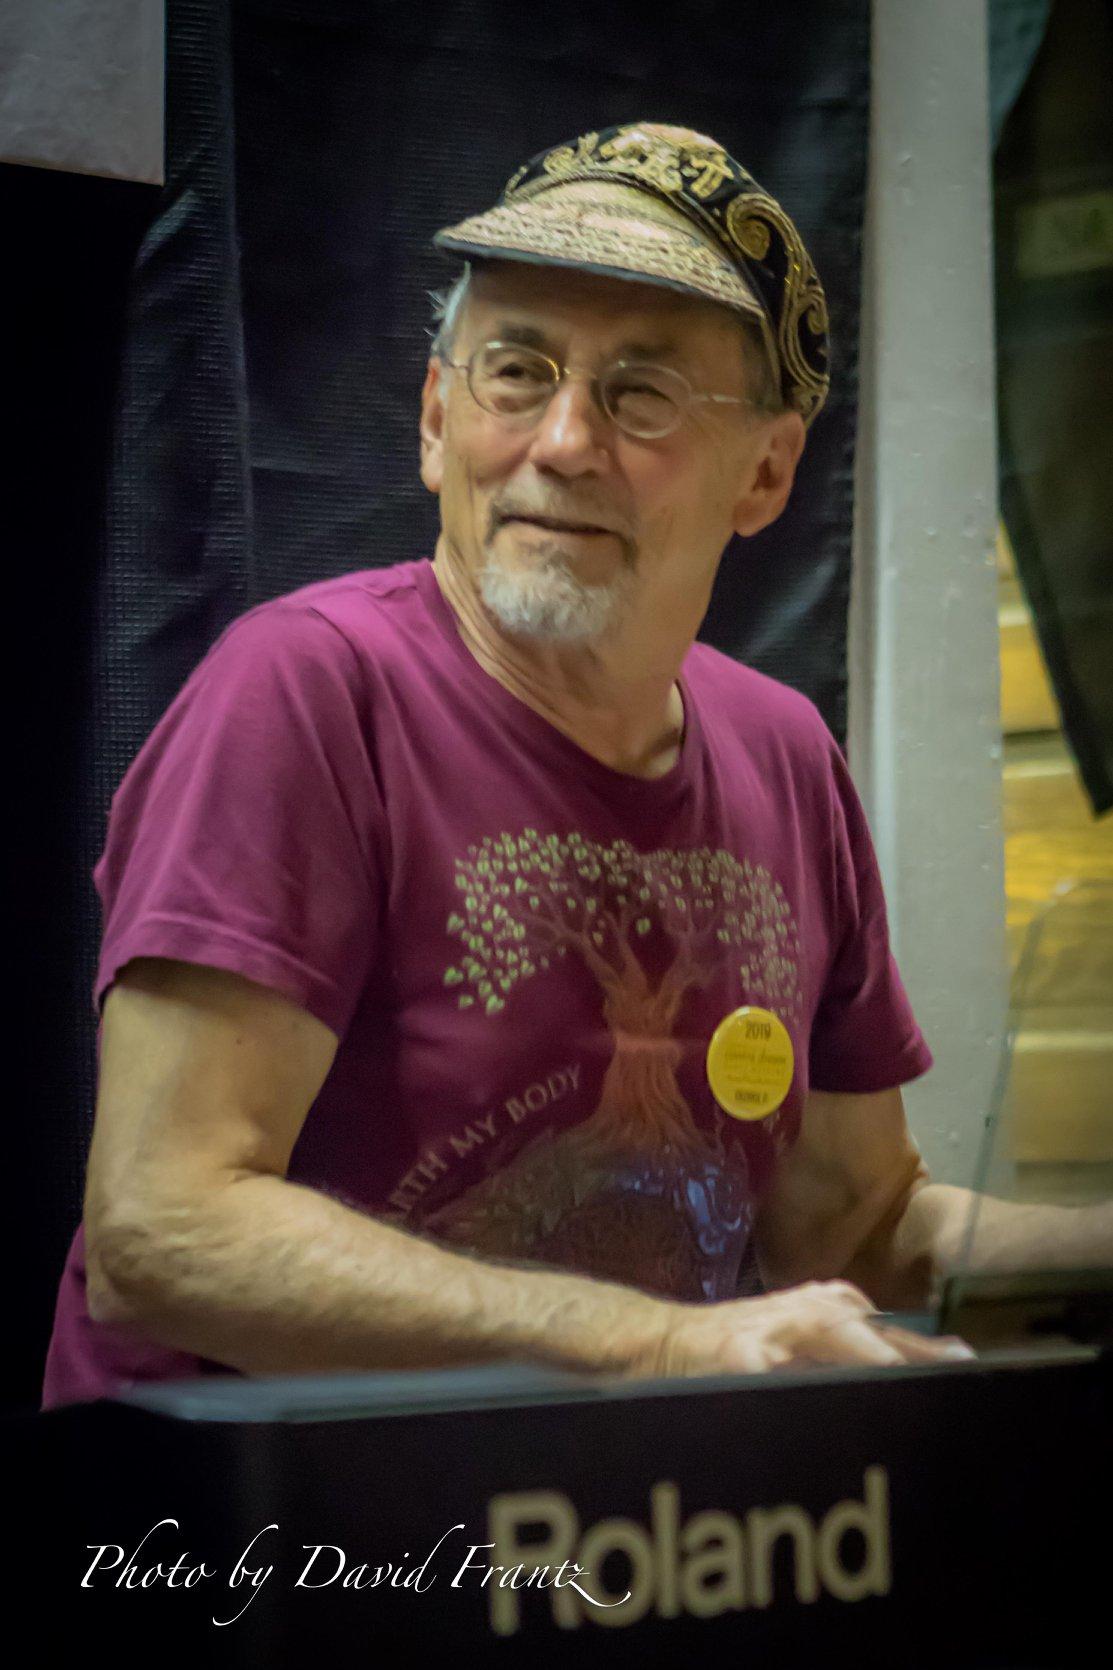 George Paul